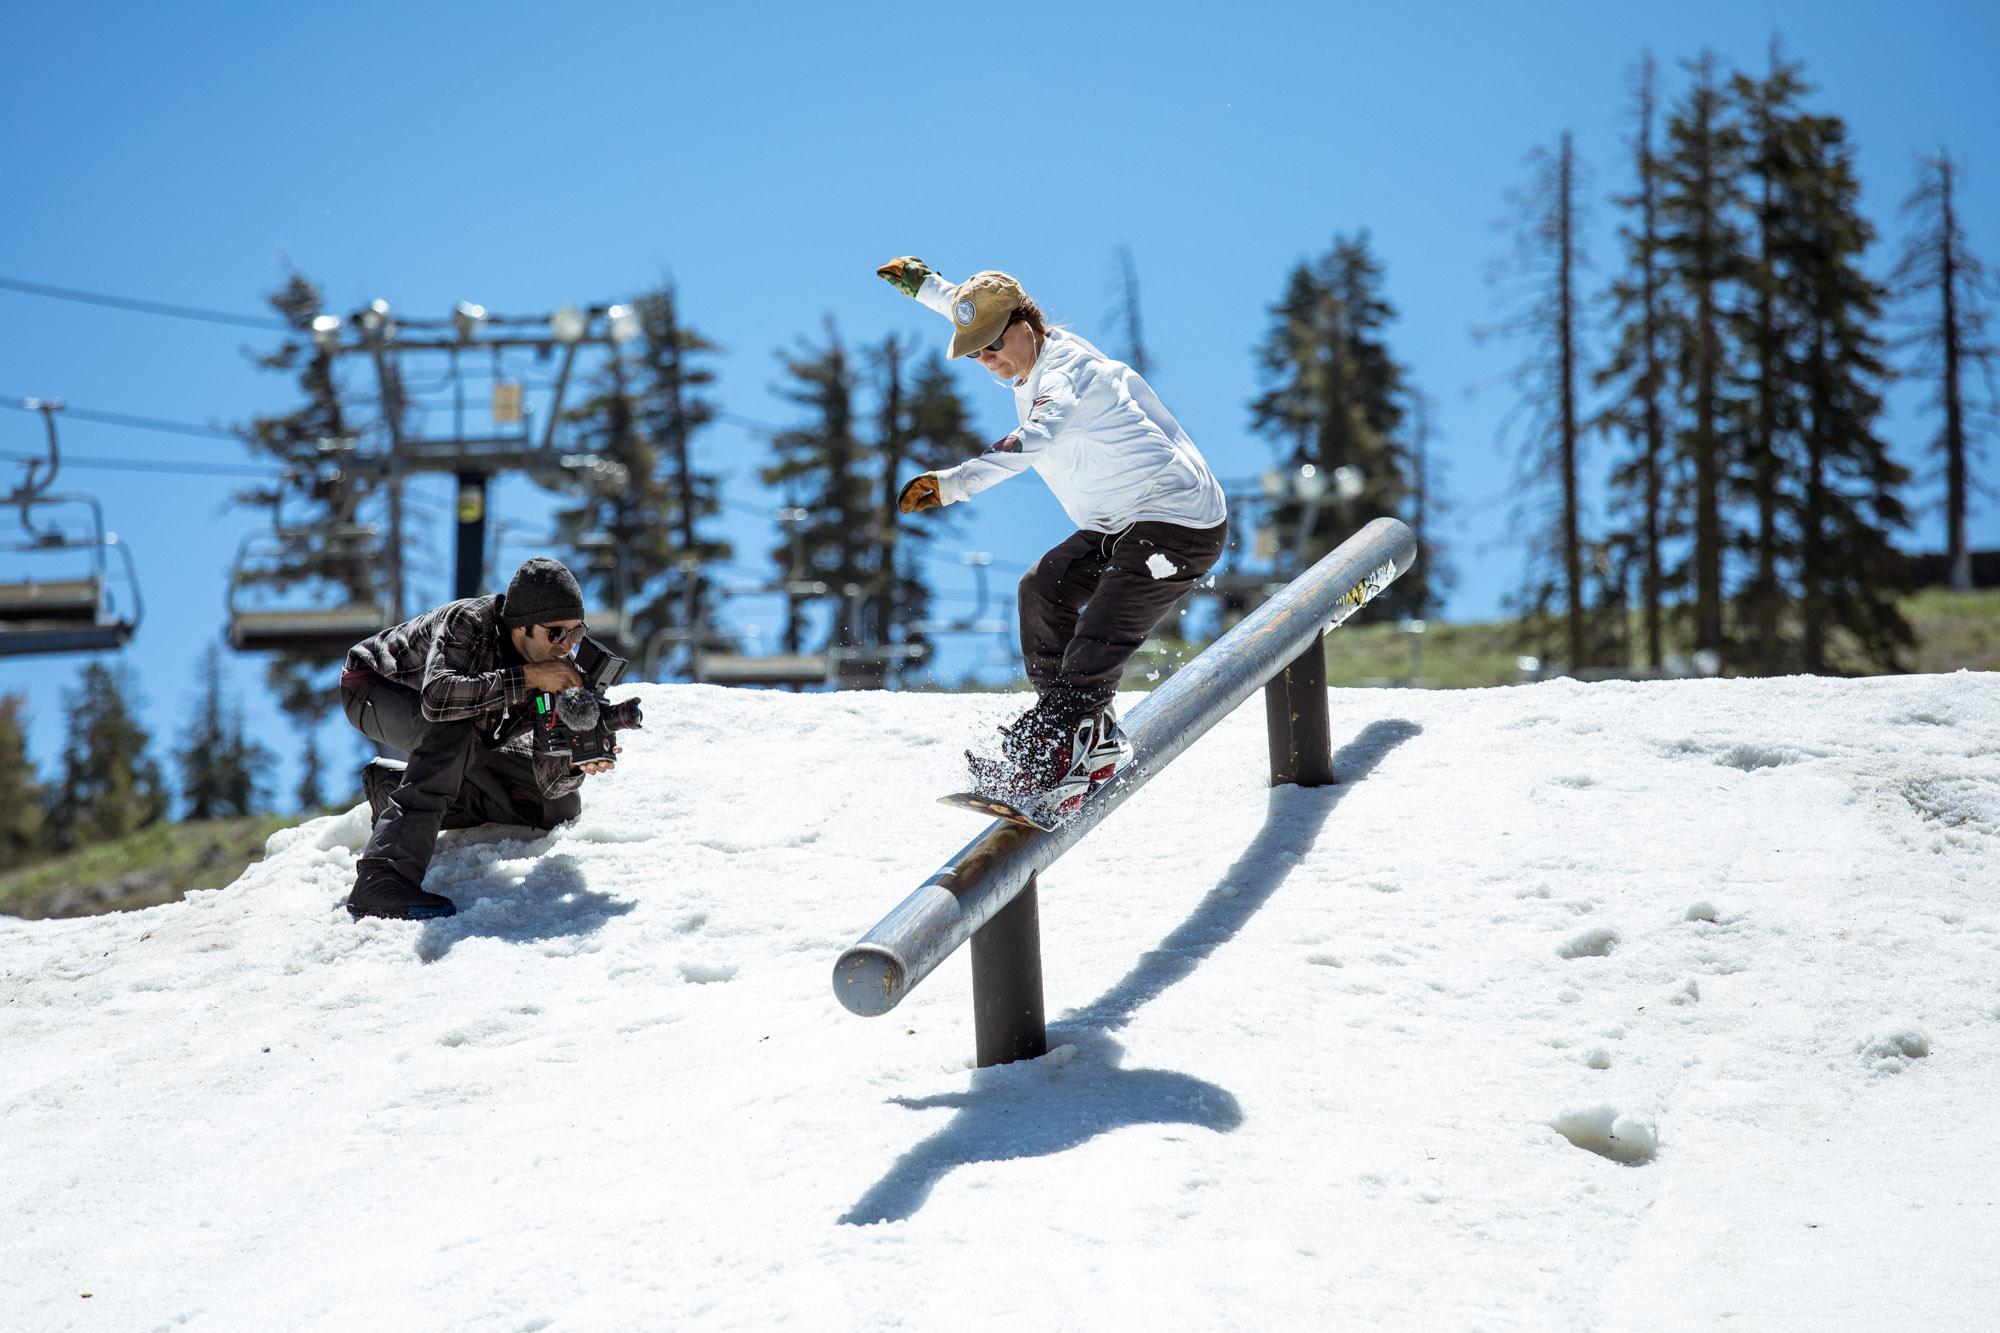 Boreal and Woodward Tahoe \u2014 Beyond the Boundaries